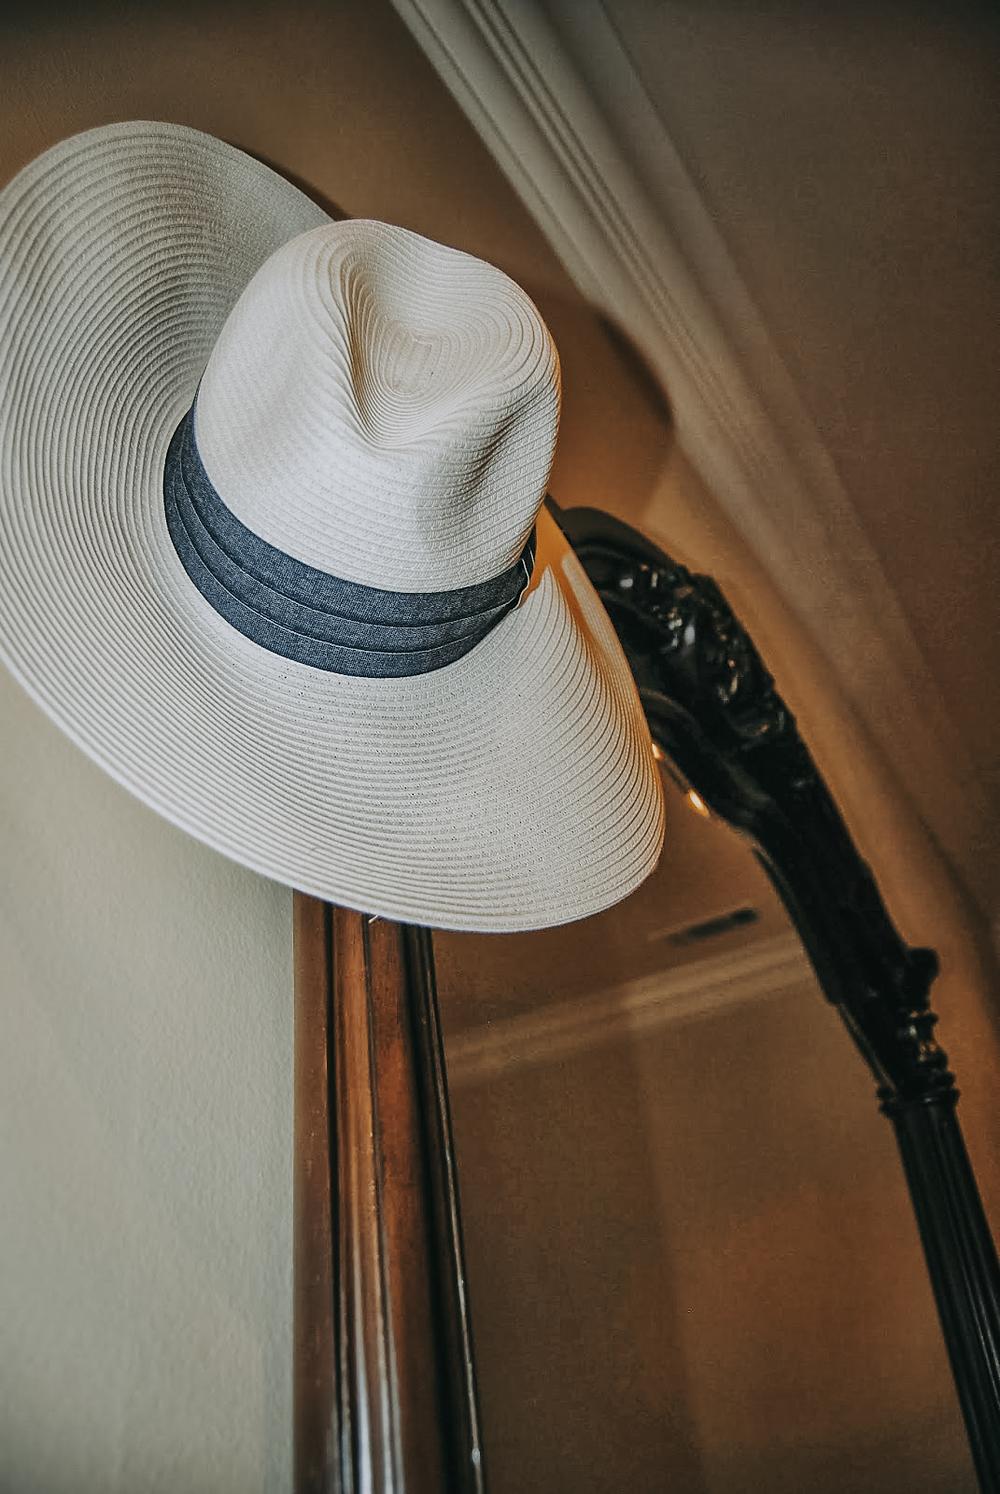 california summer pool hat